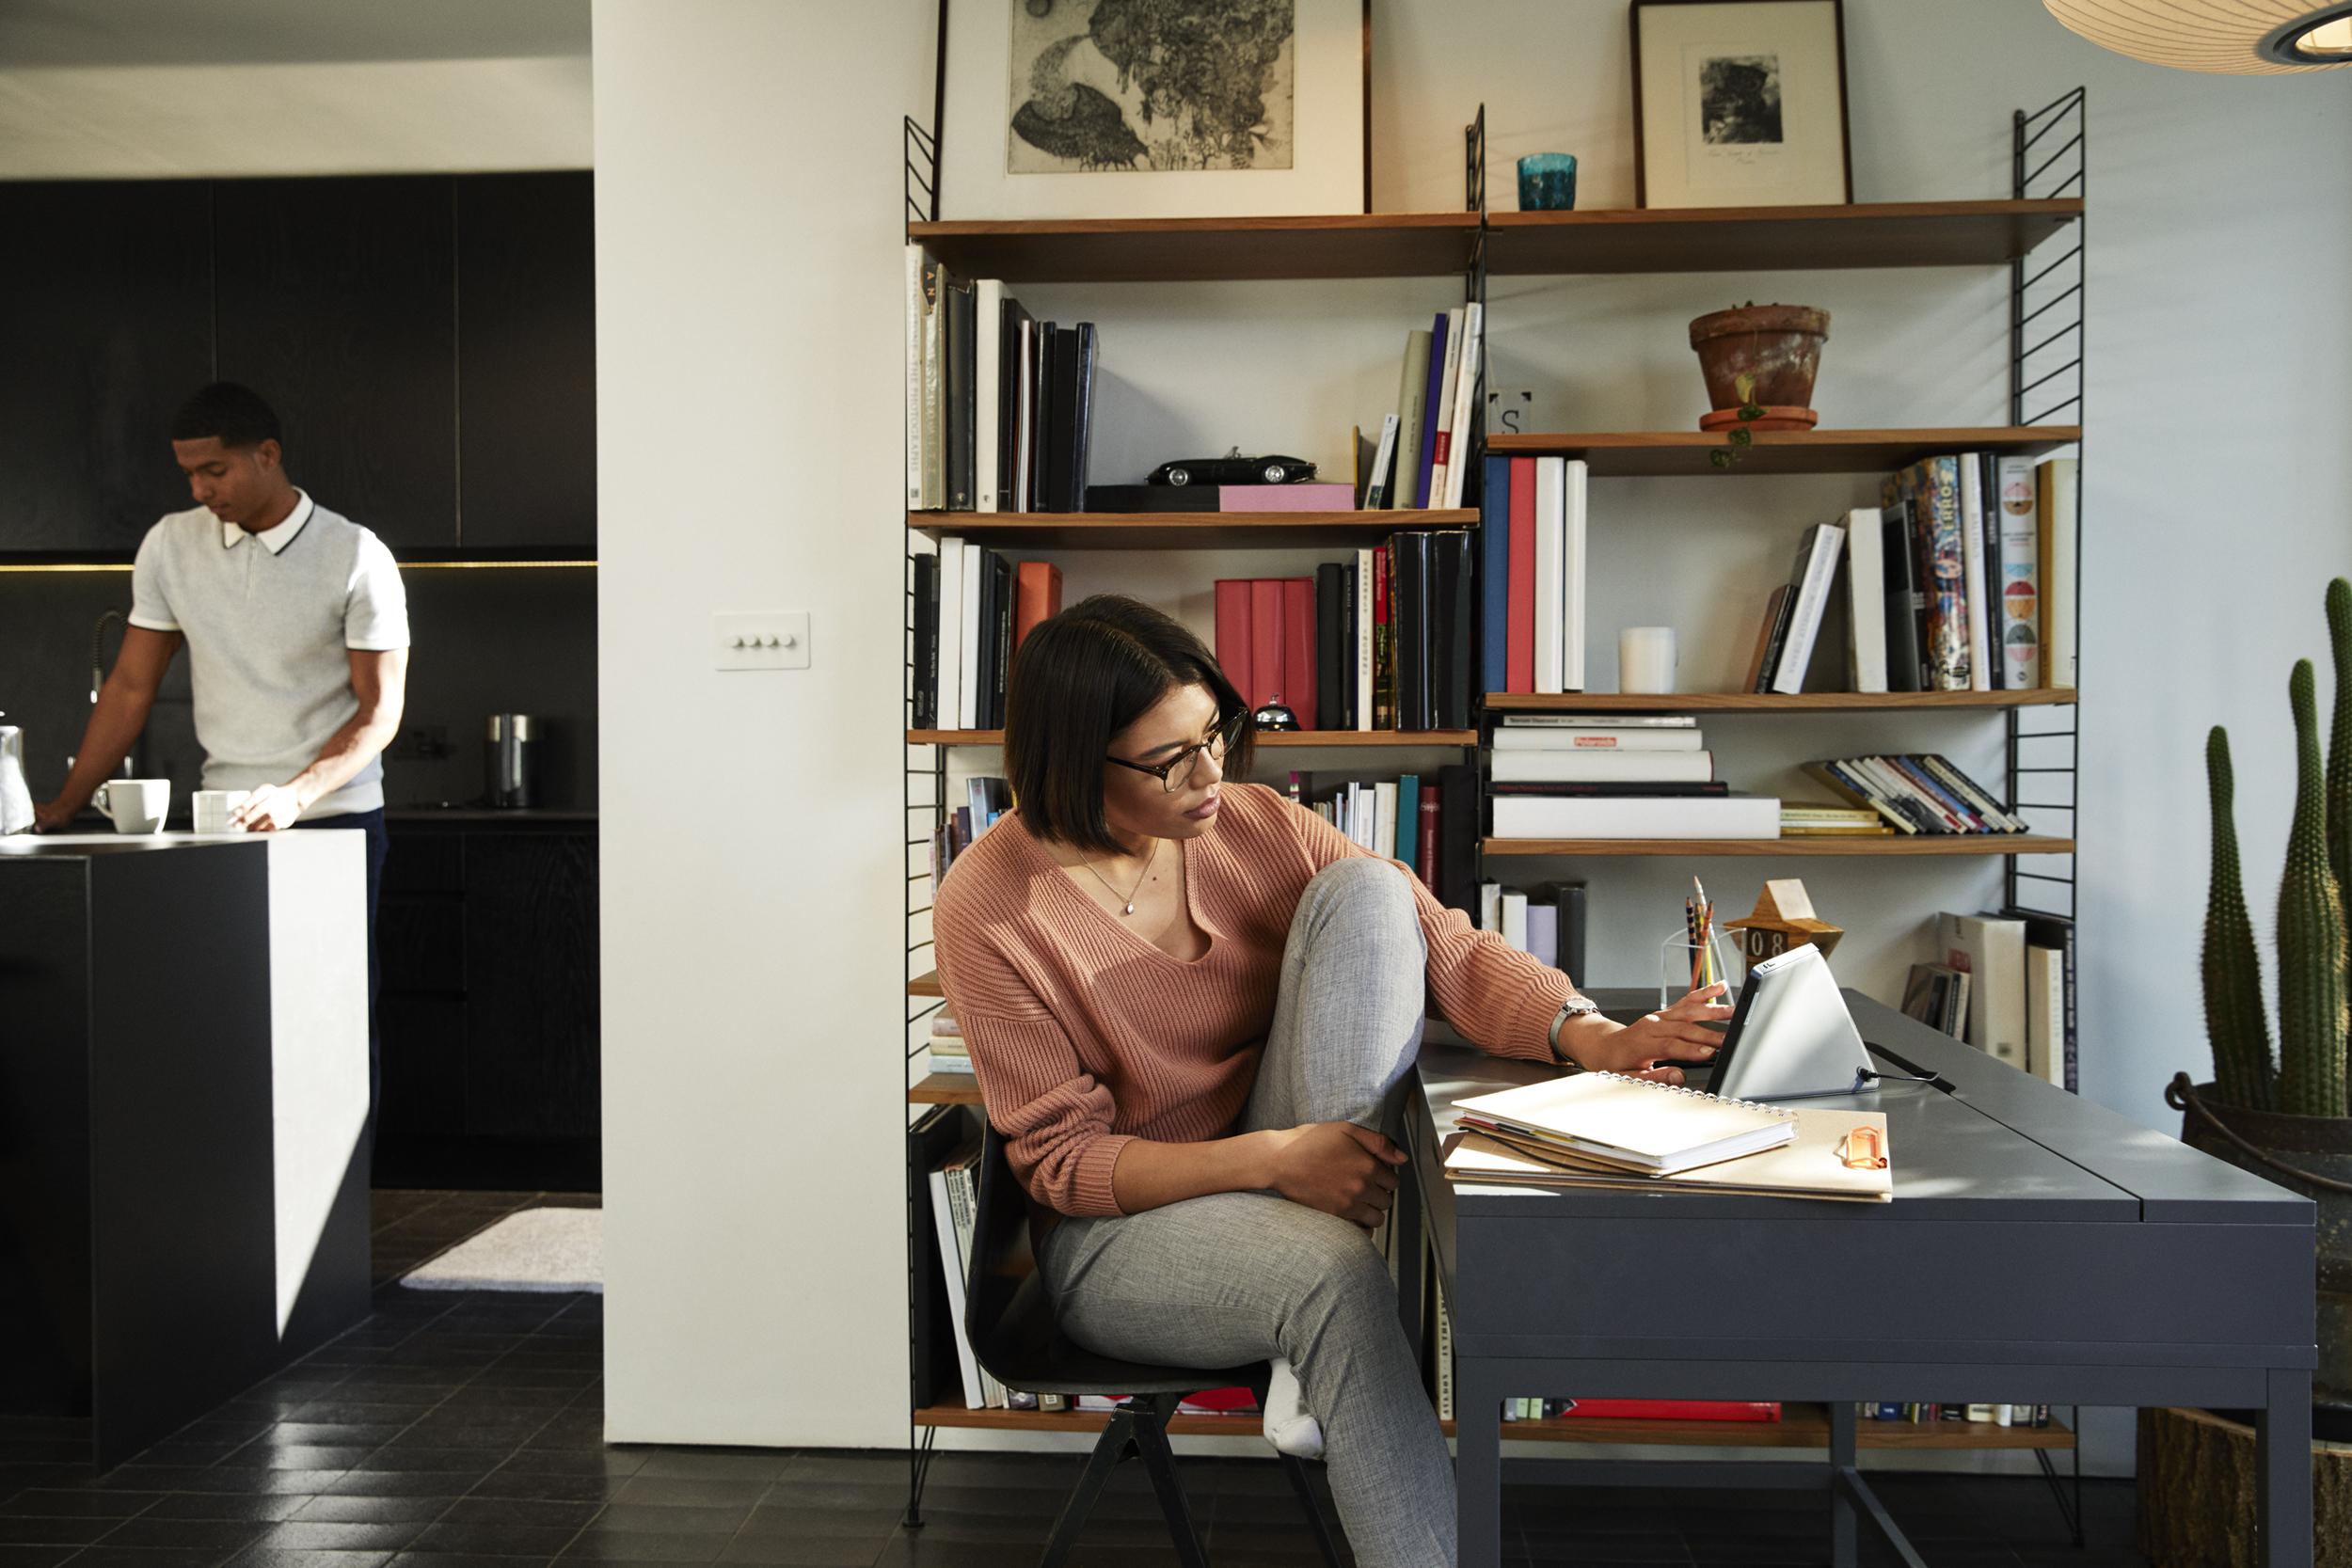 Smartworking: the future according to Lenovo